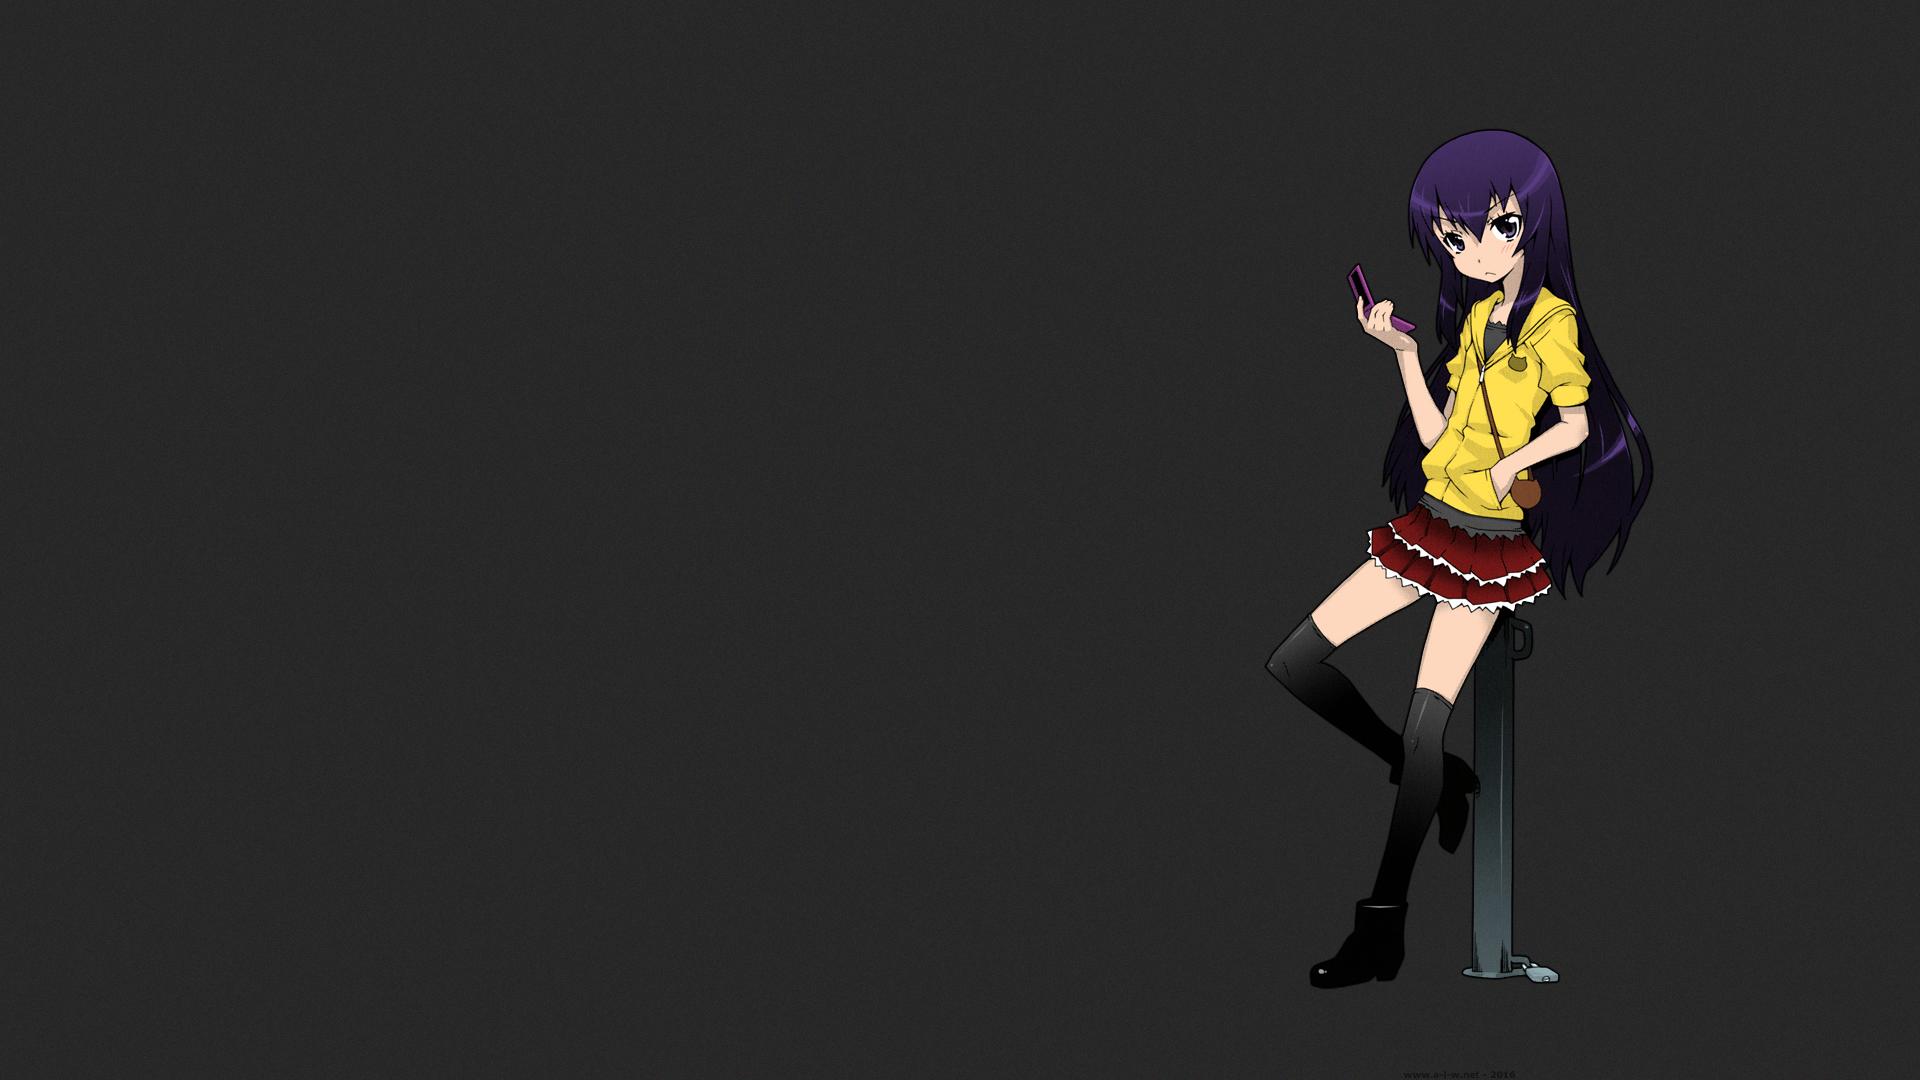 Fond Décran Cheveux Longs Anime Filles Anime Bas